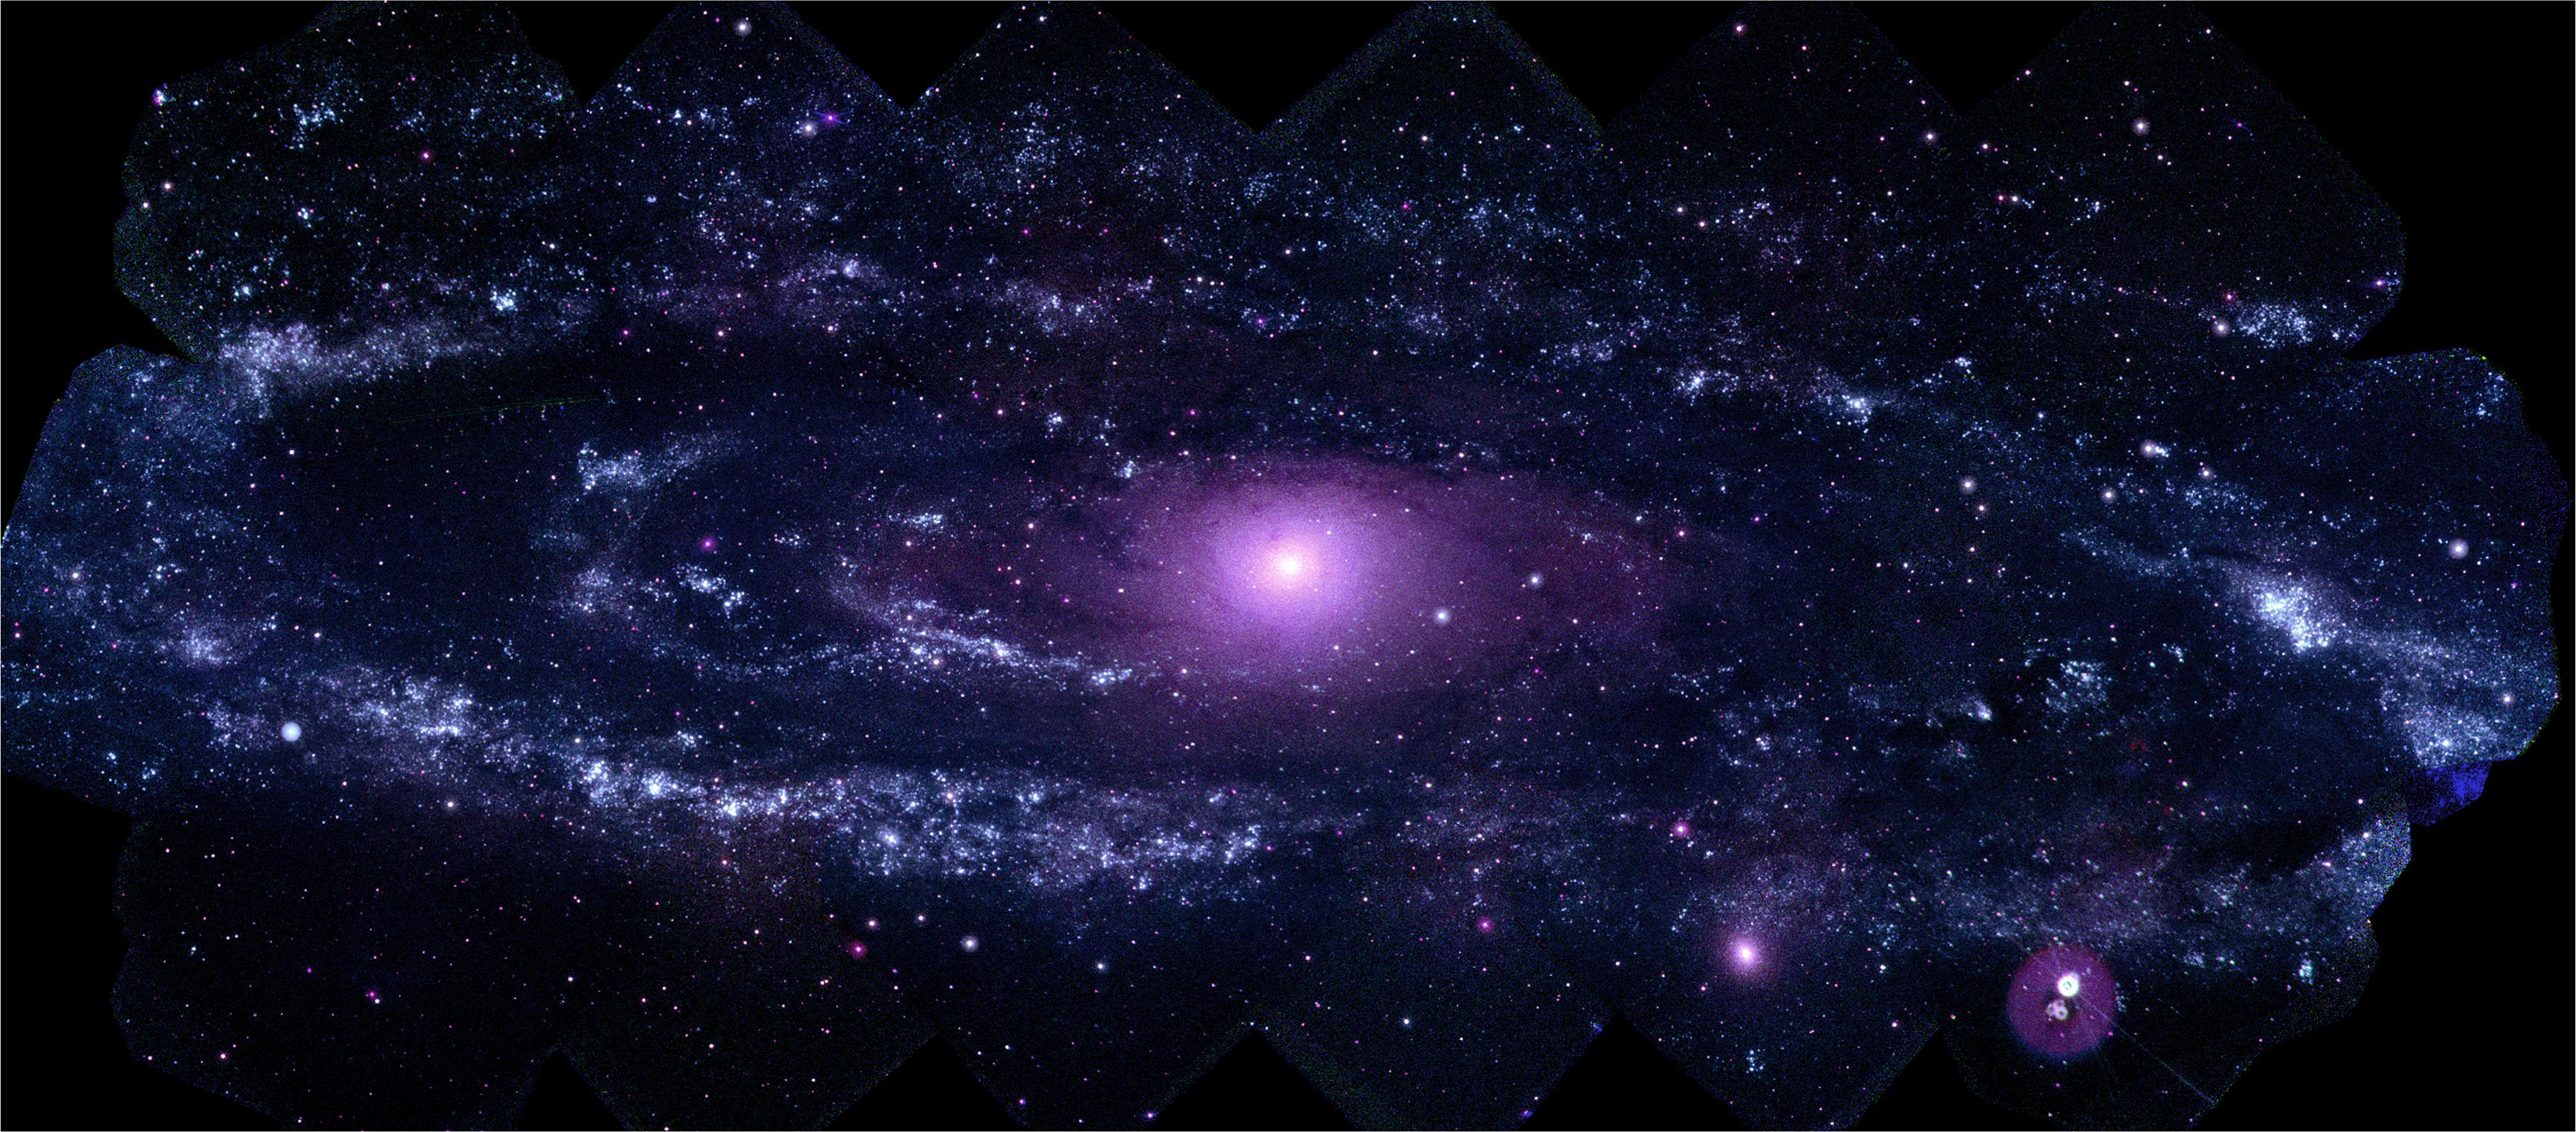 highest resolution image